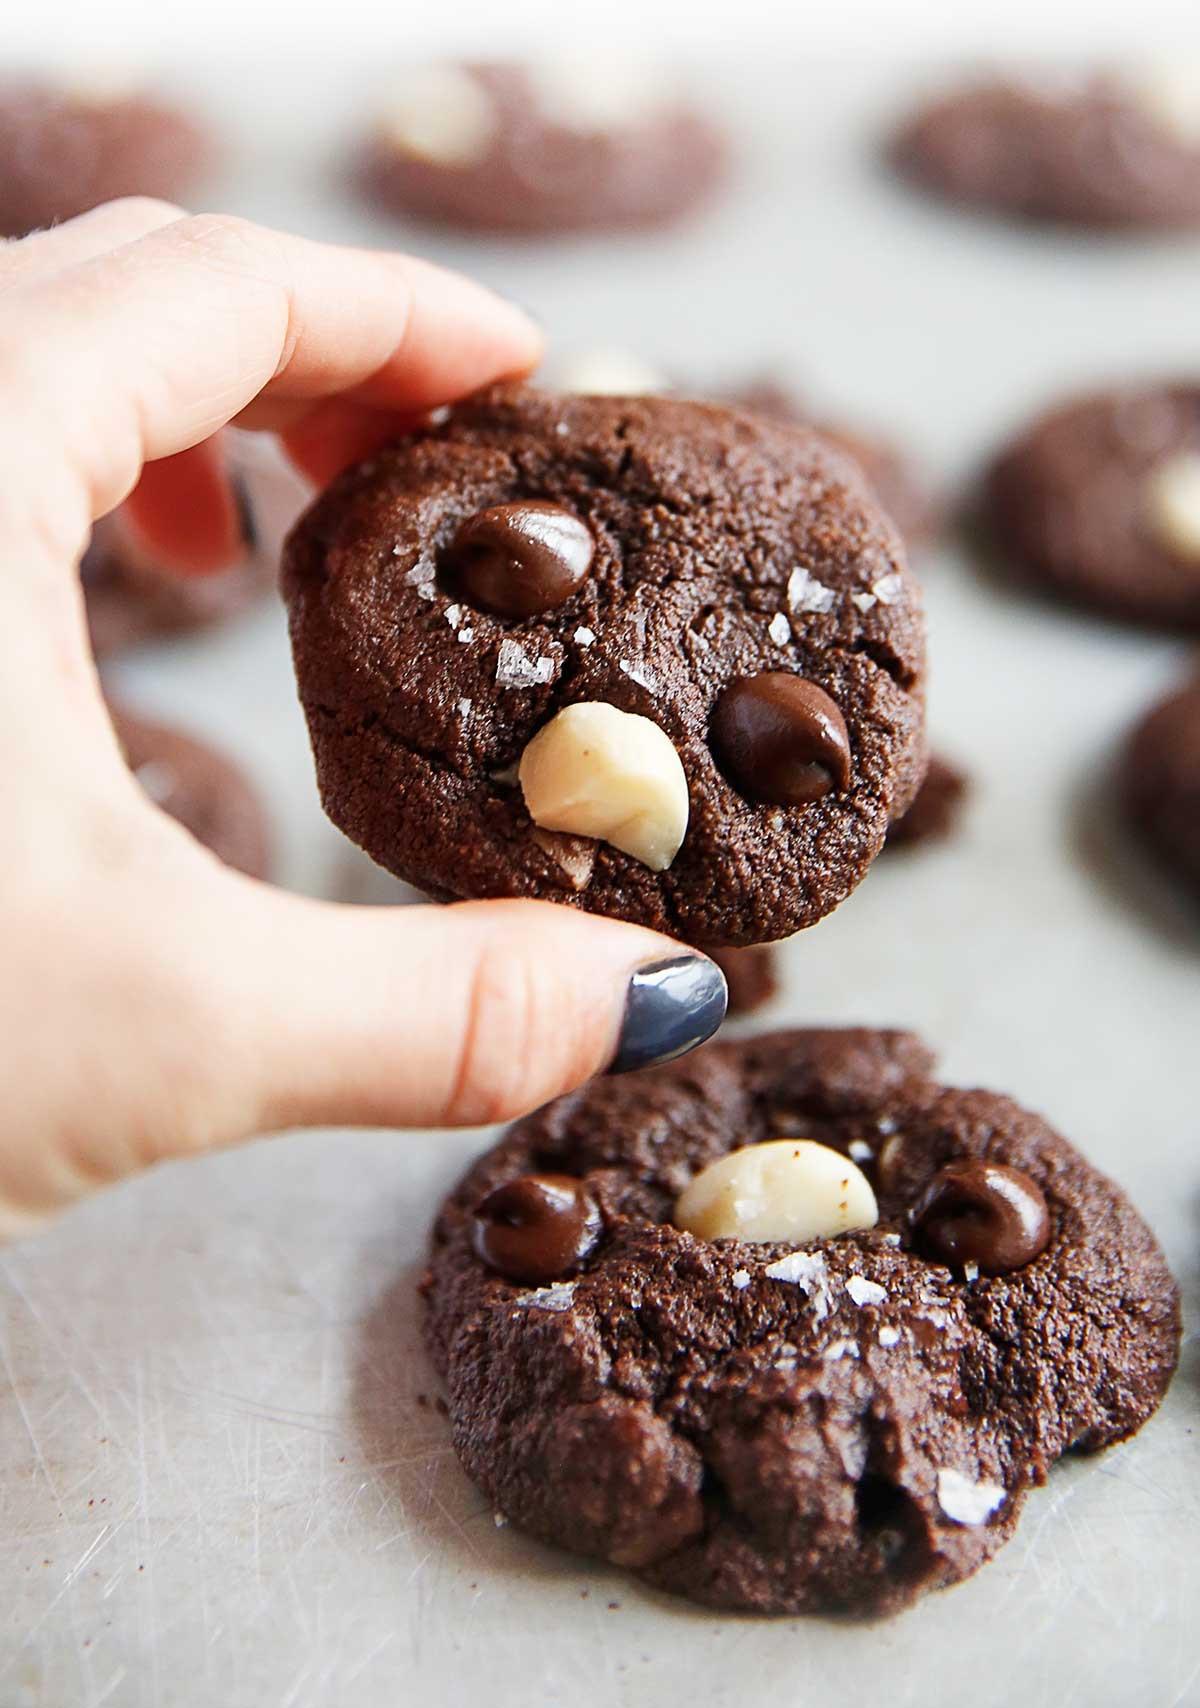 Chocolate Macadamia Nut Cookies  Double Chocolate Chunk Macadamia Nut Cookies Lexi s